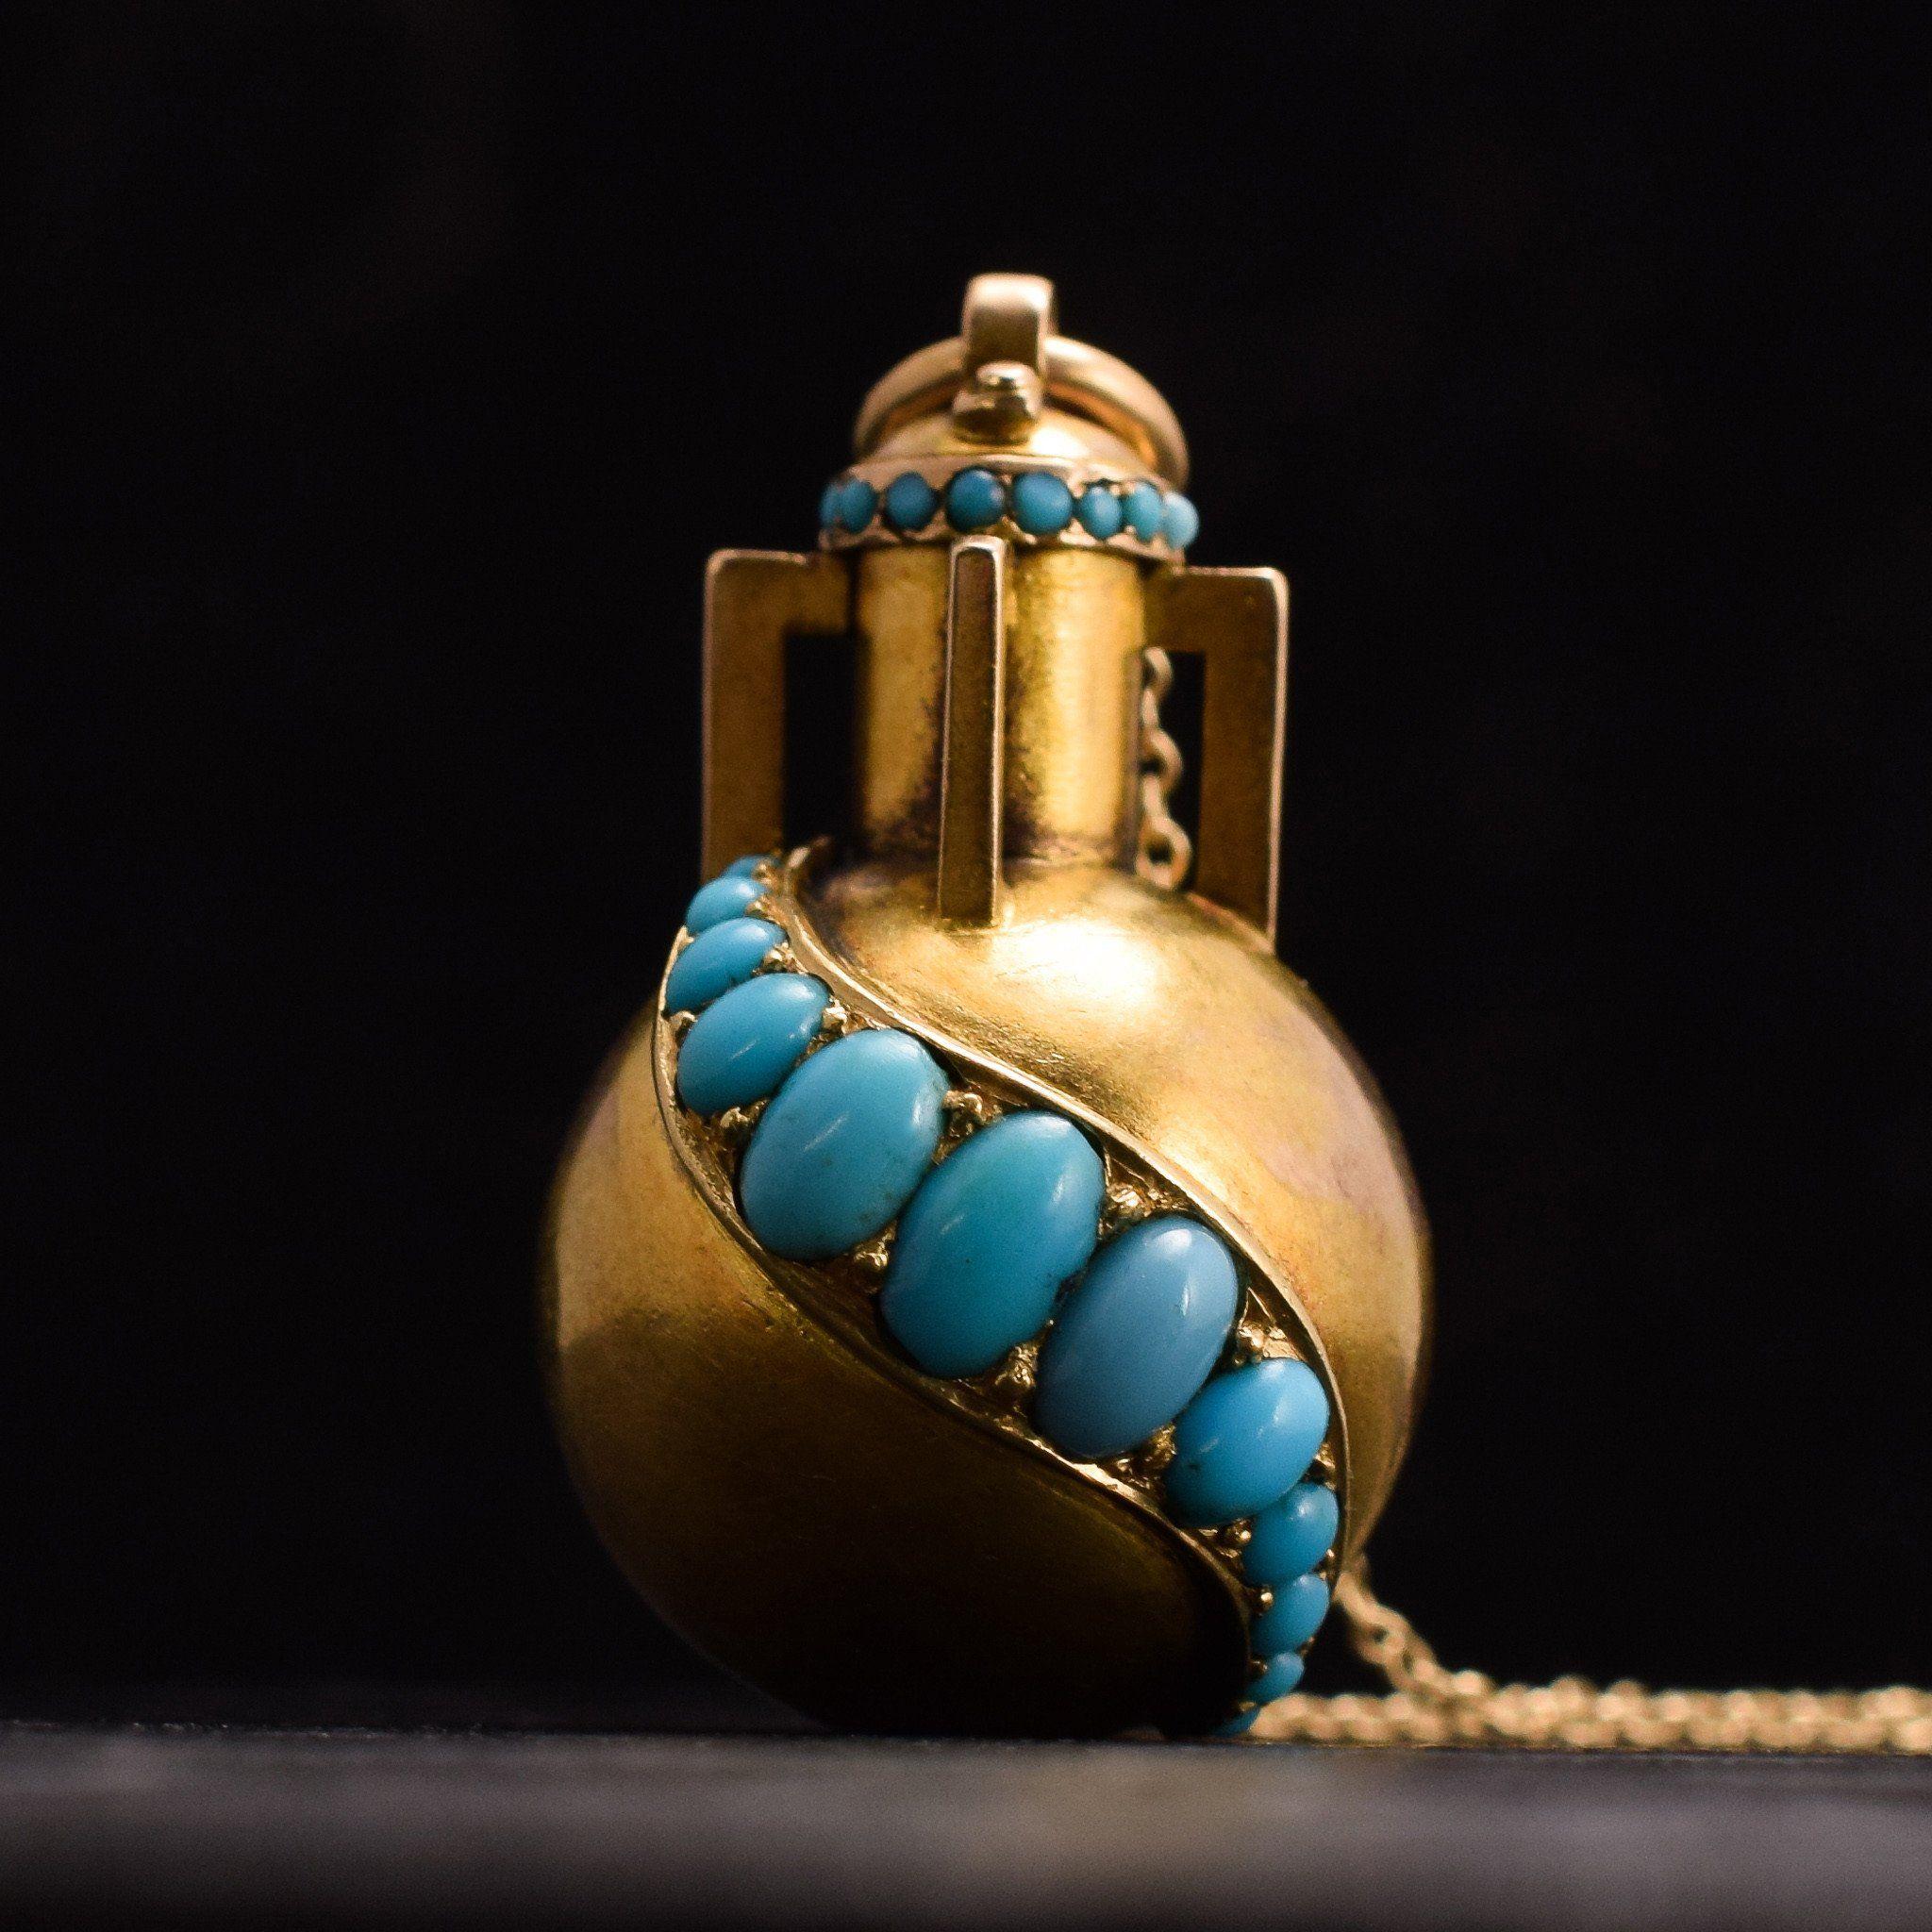 Detail of Victorian Turquoise Amphora Locket